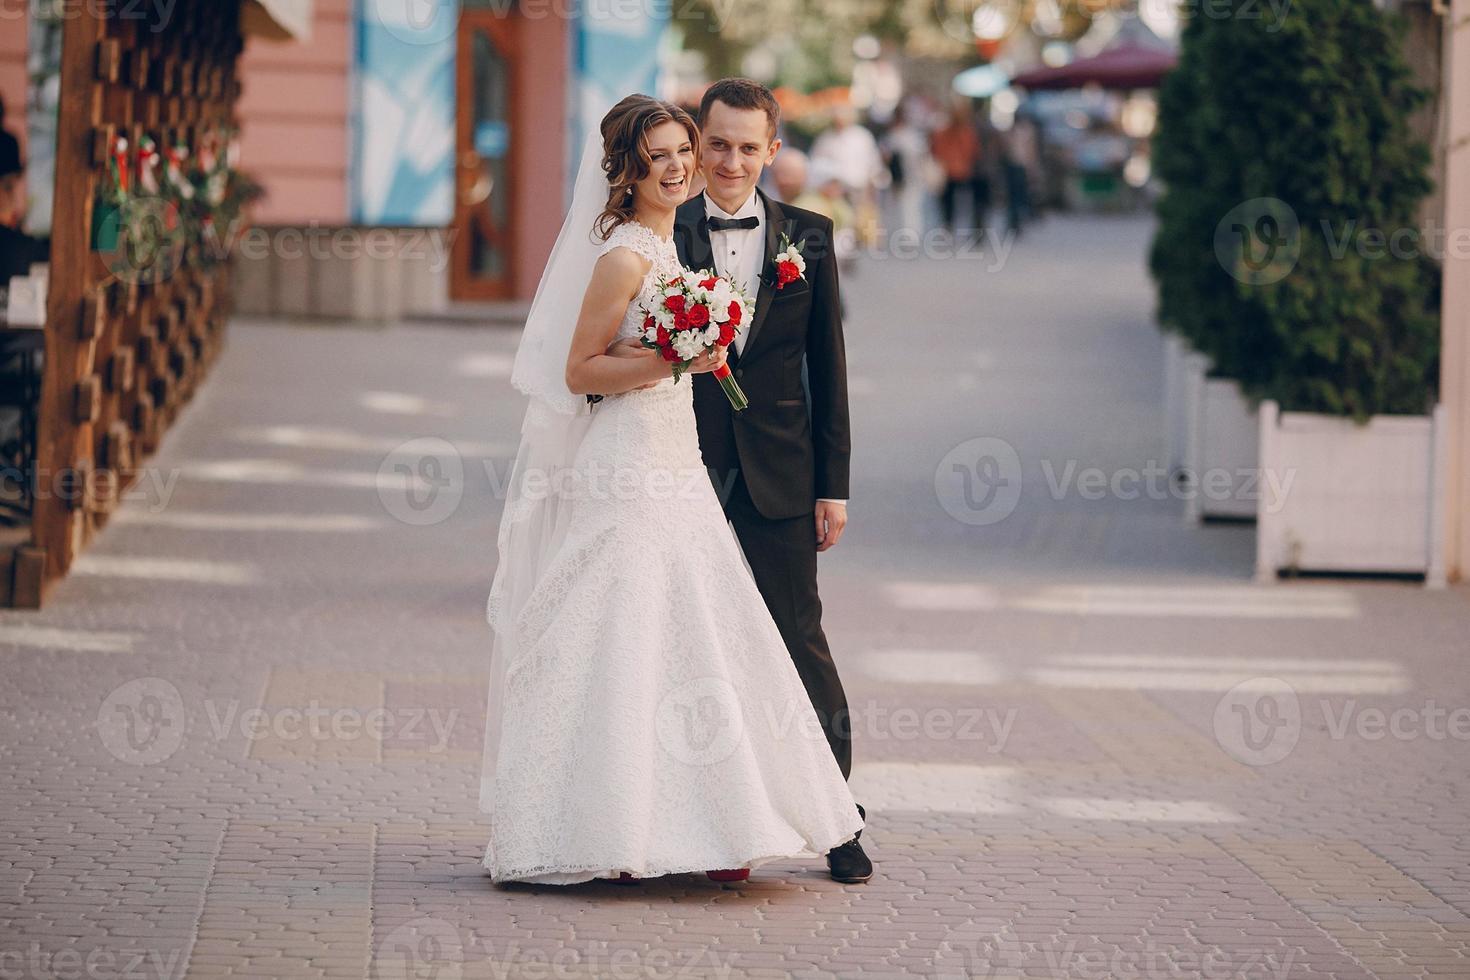 wedding day beautiful couple photo